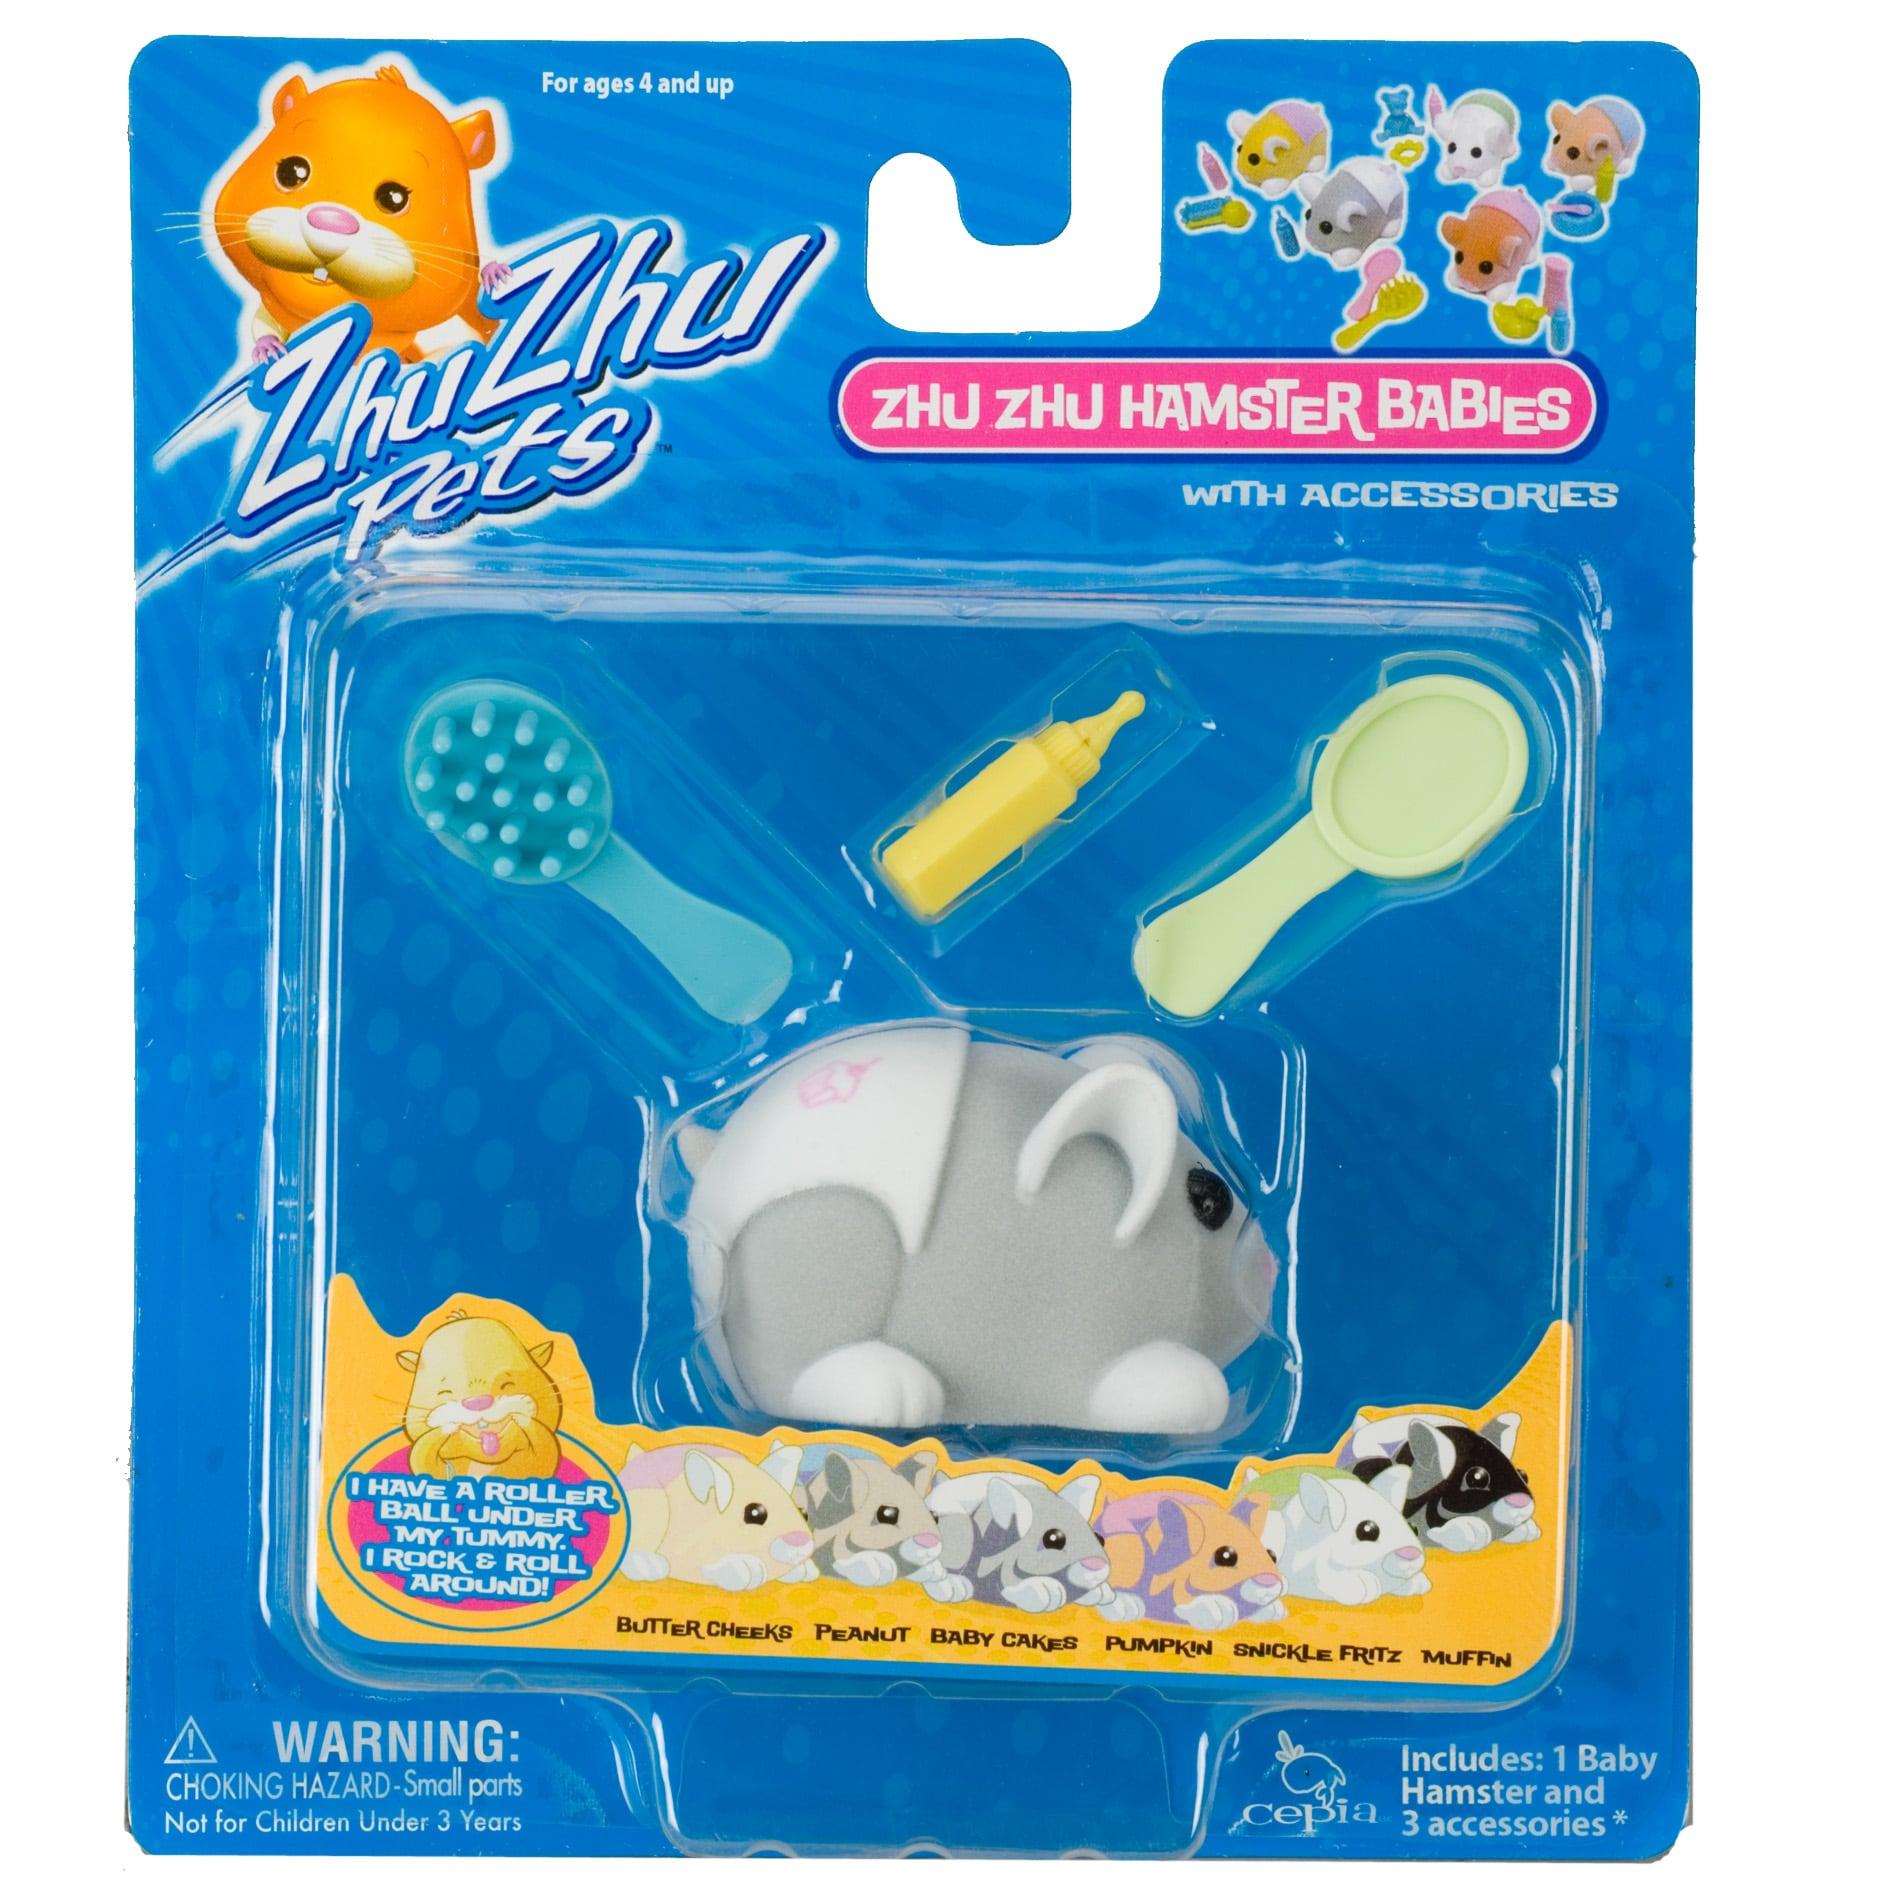 Zhu Zhu Babies Baby Cakes Toy Hamster